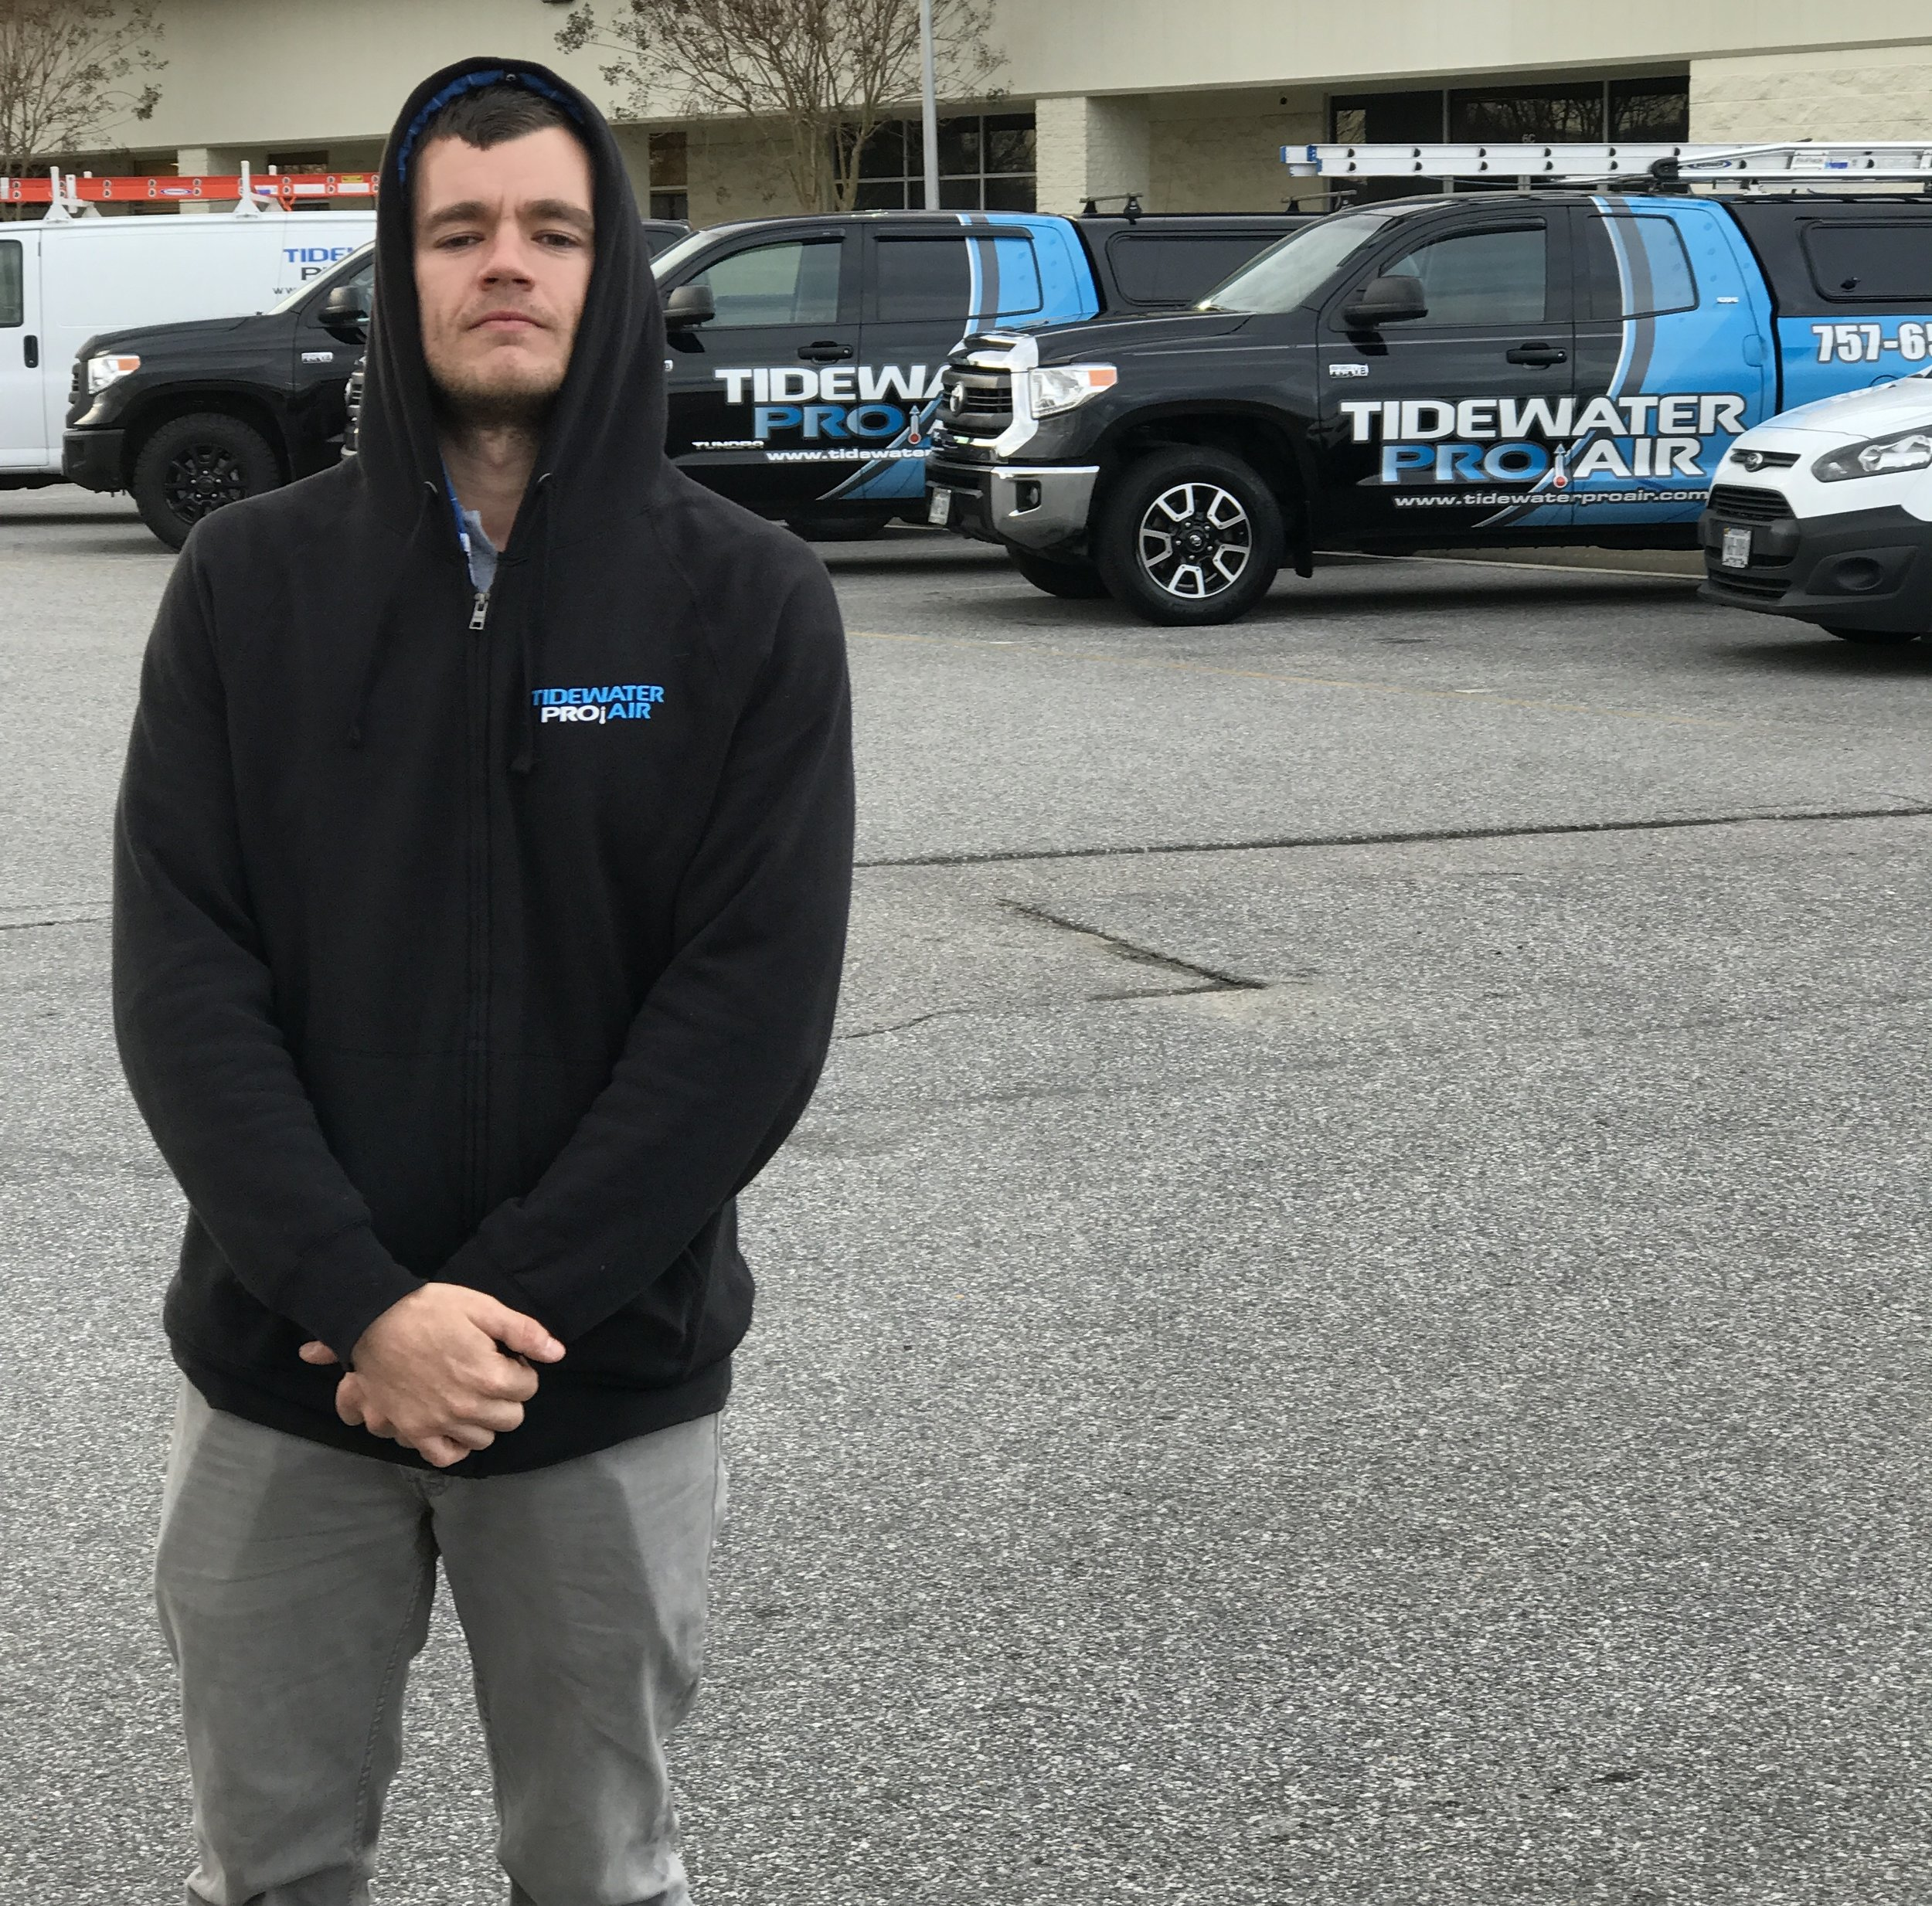 Brandon Nero with Tidewater Pro Air